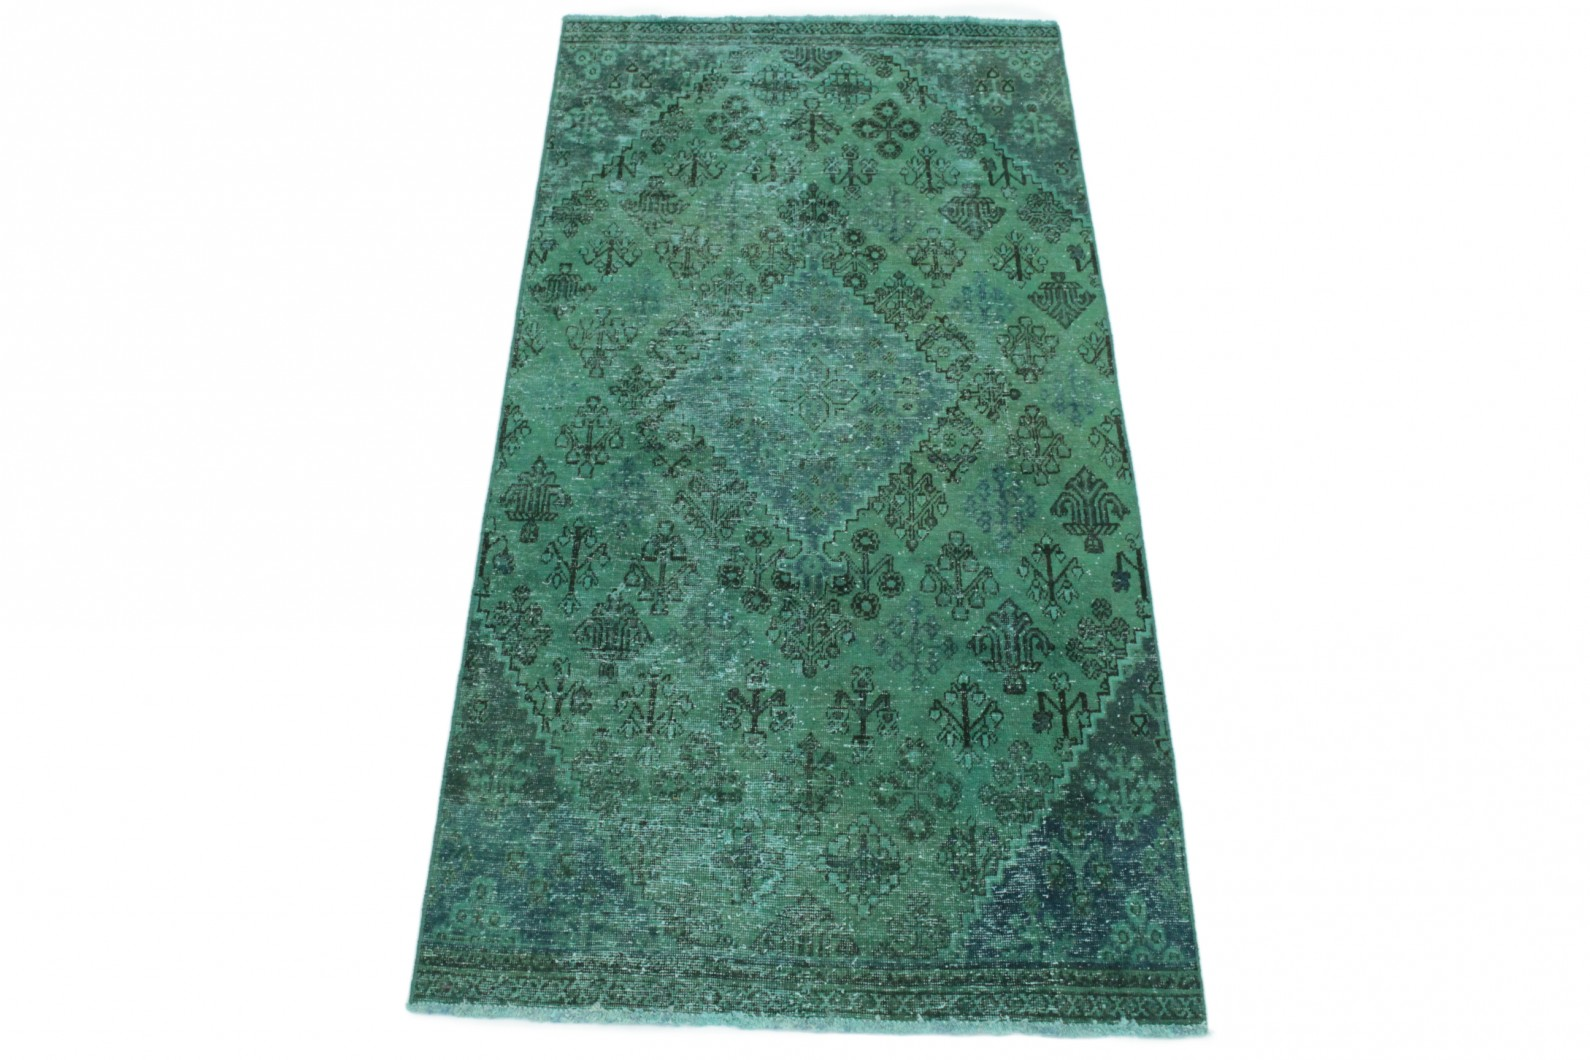 vintage teppich gr n in 250x120 1001 167036 bei kaufen. Black Bedroom Furniture Sets. Home Design Ideas